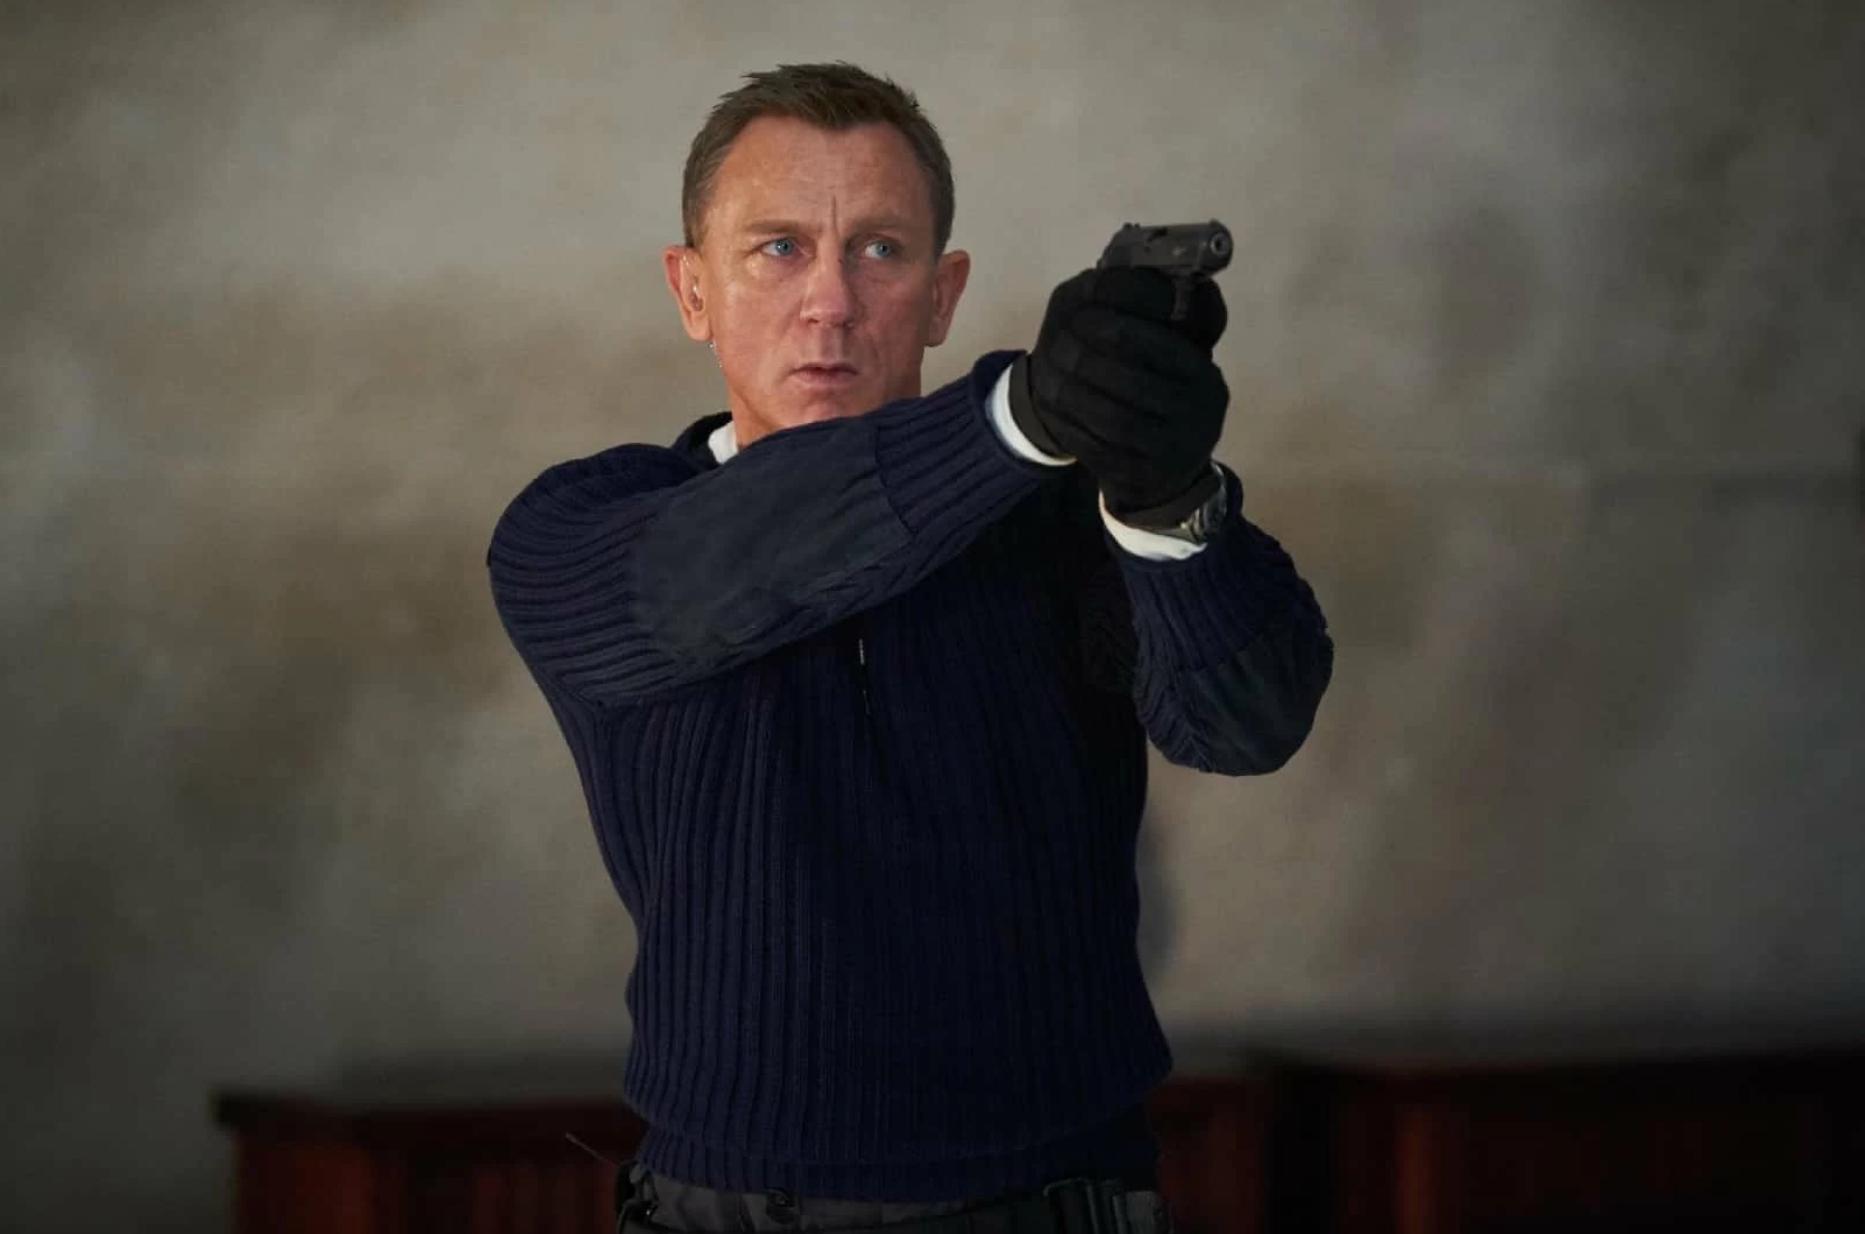 no-time-to-die-daniel-craig-007-james-bond